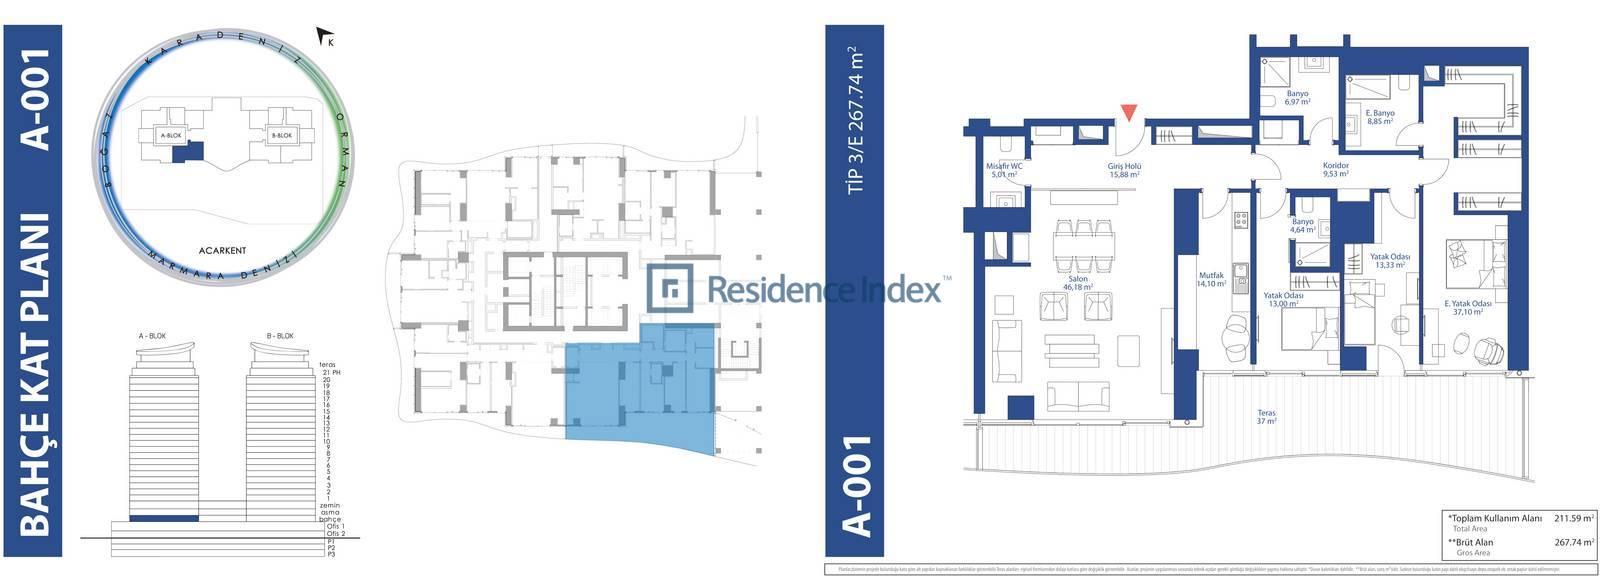 AcarBlu Residence Tip 3E